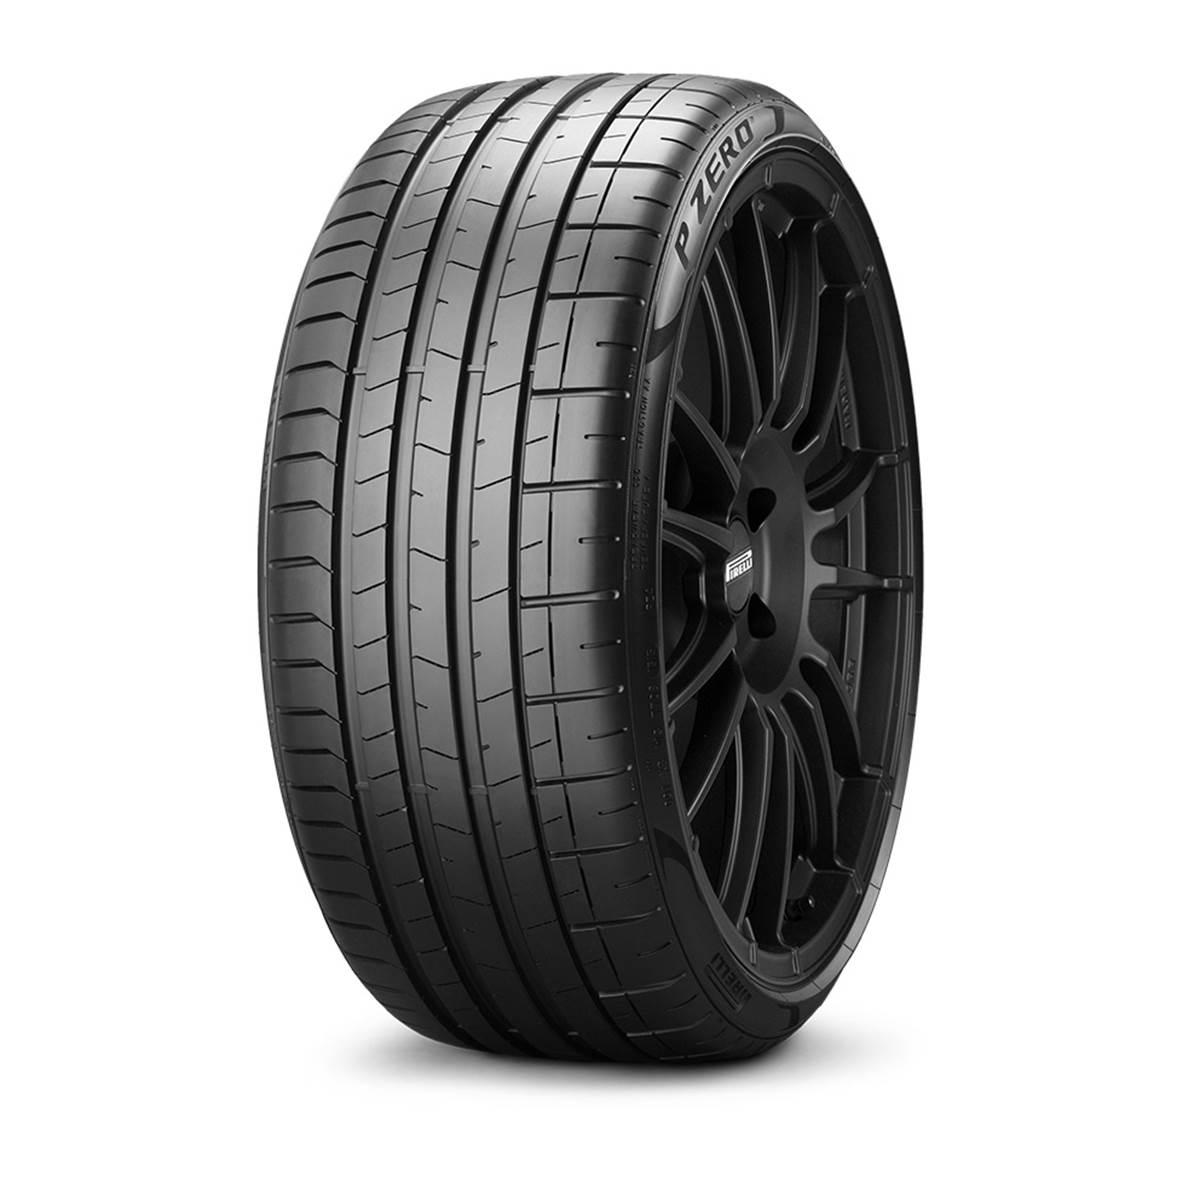 Pneu Pirelli 235/35R19 91Y P-Zero homologué Audi XL